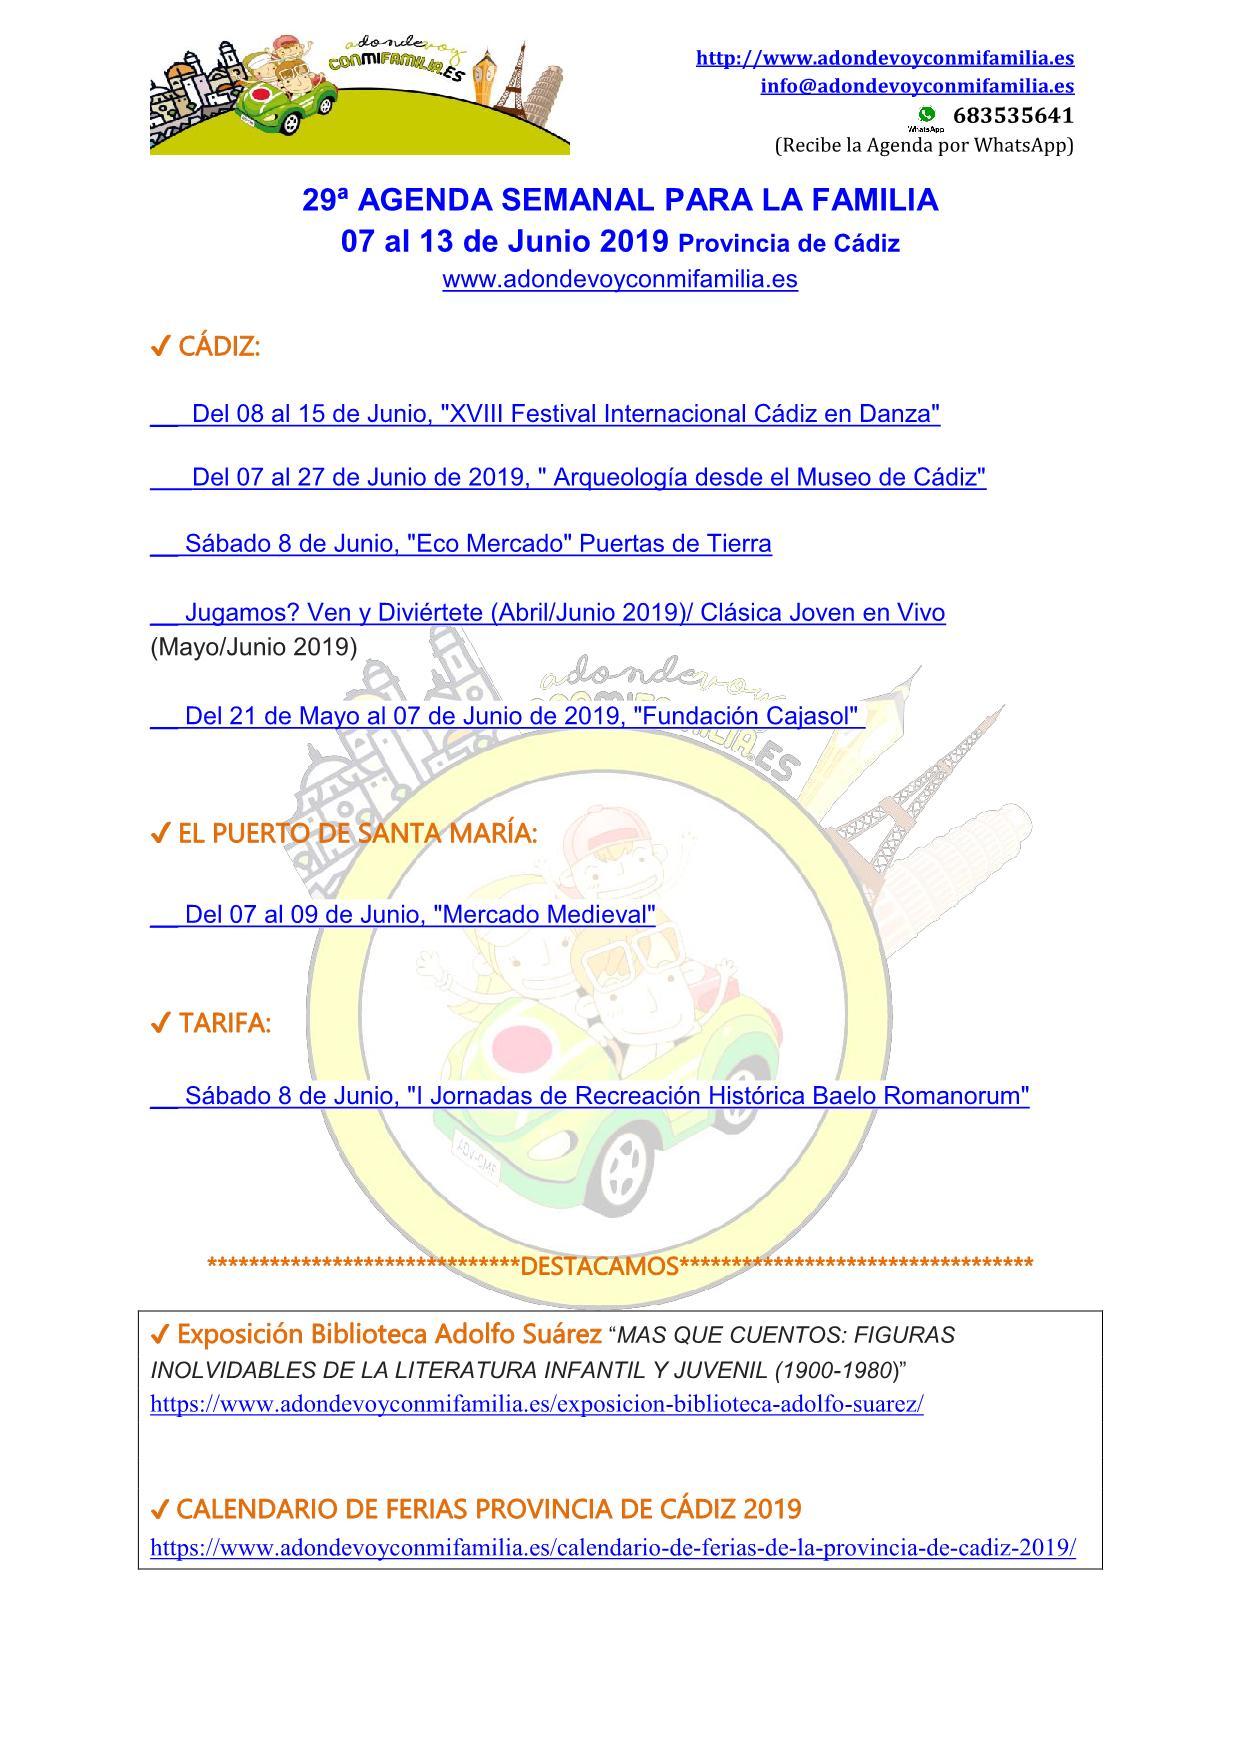 Agenda semanal familiar 07 al 13 Junio 2019